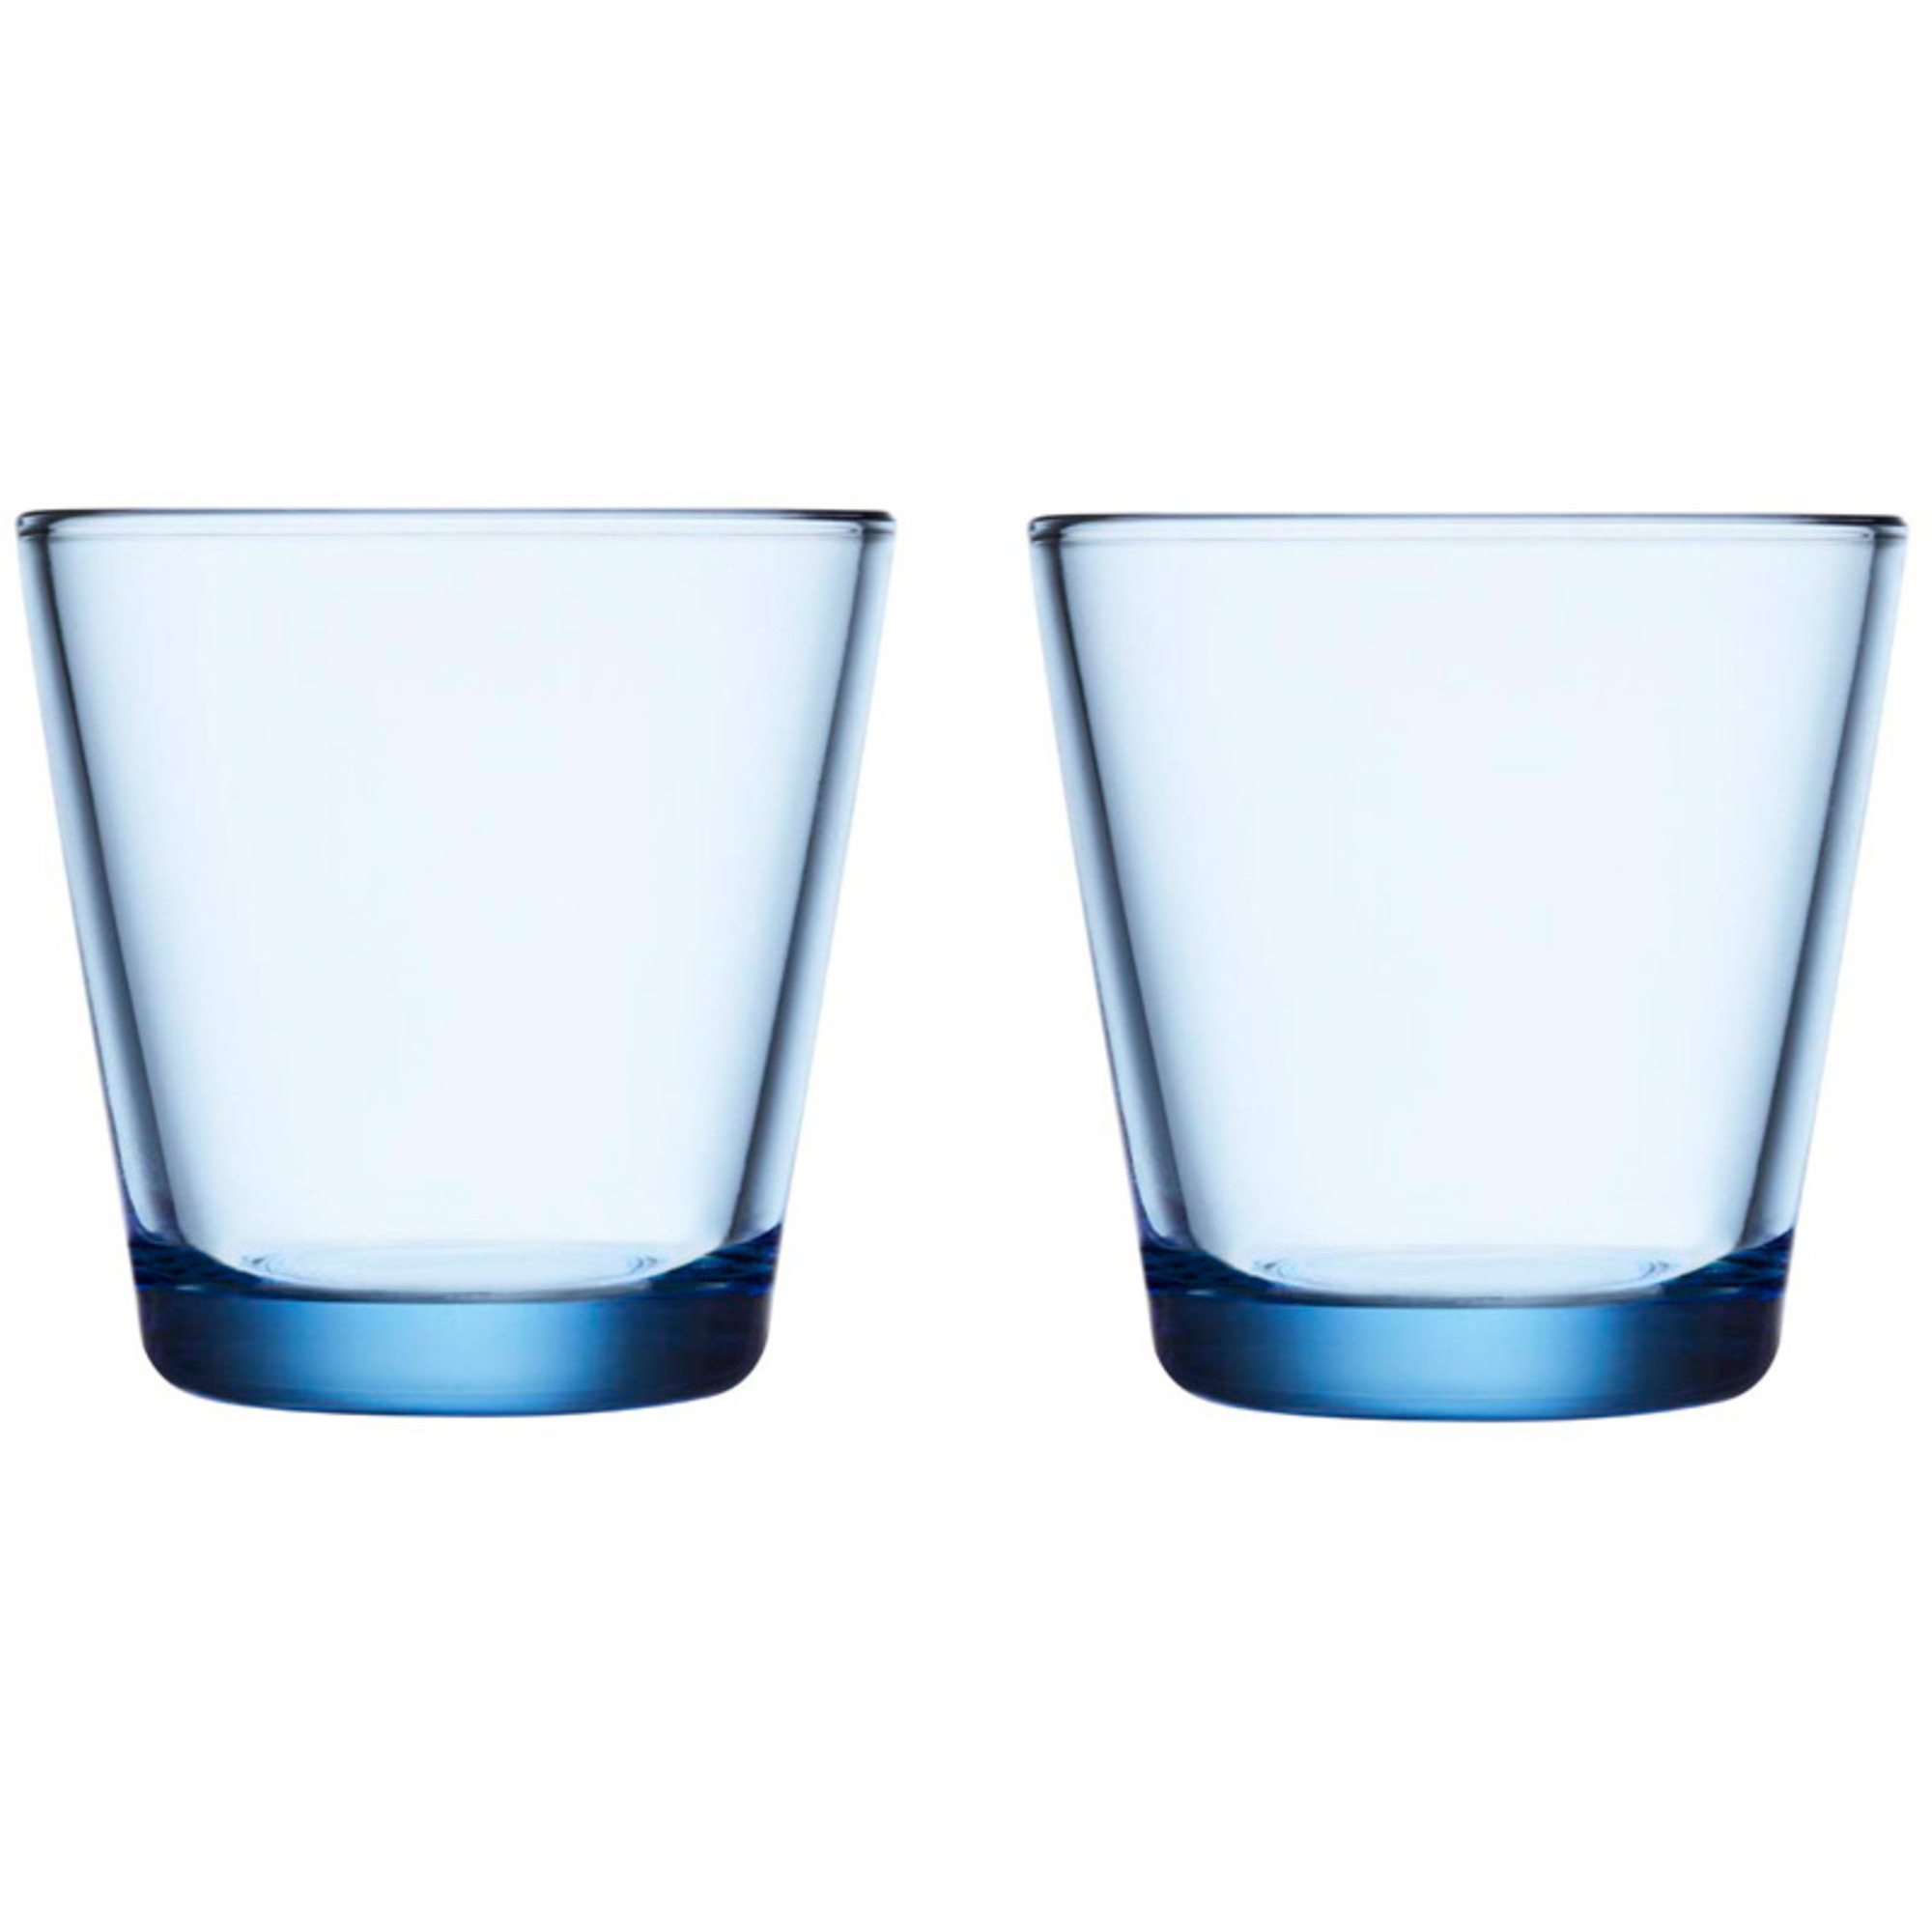 Iittala Kartio Glas 21 cl Aqua 2-pack